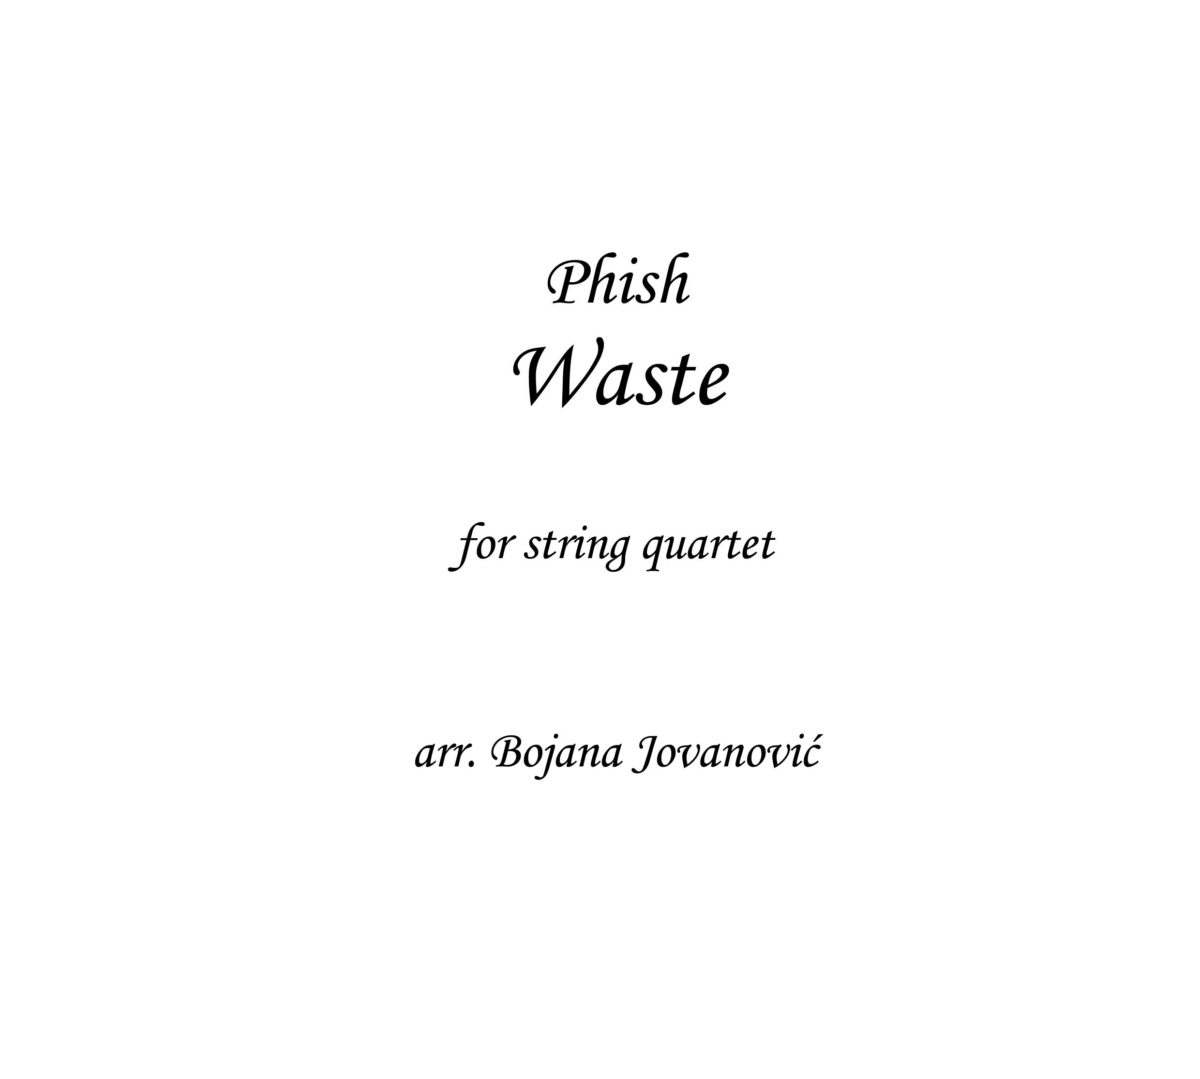 Waste (Phish) - Sheet Music